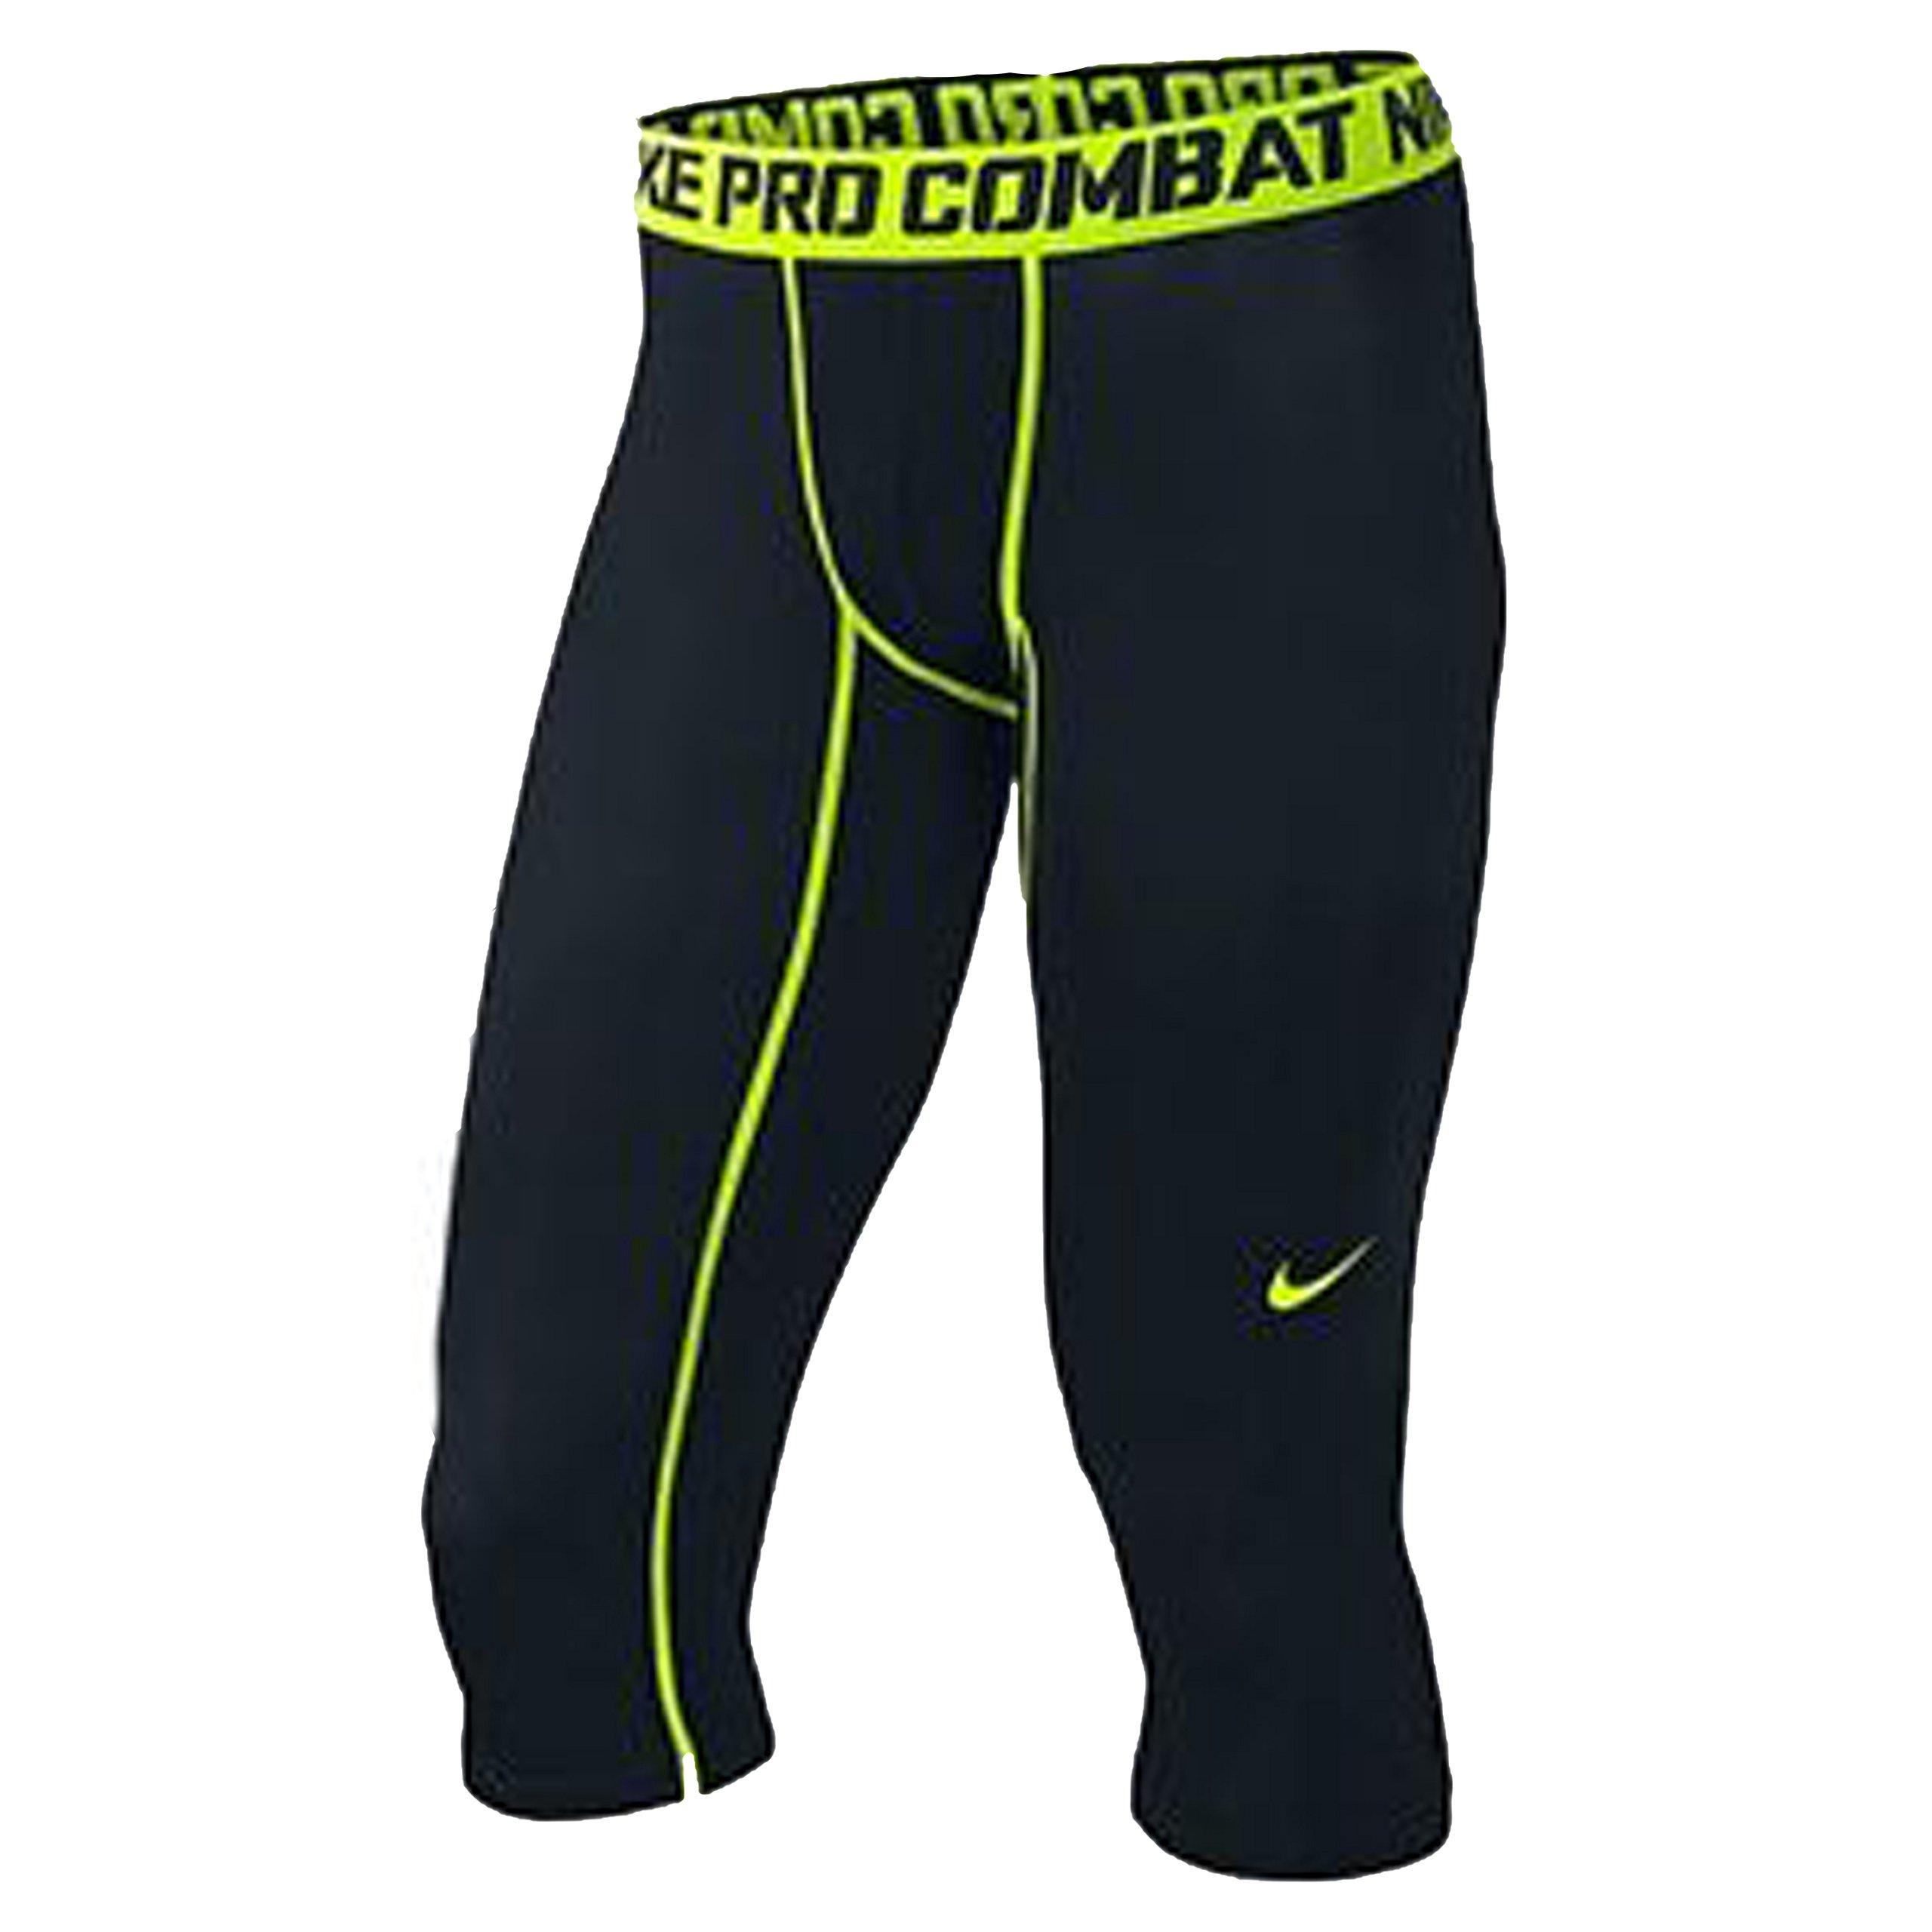 Nike Men's Pro Combat Core Compression 3/4 Tight Black/Volt LG 19 by Nike (Image #1)